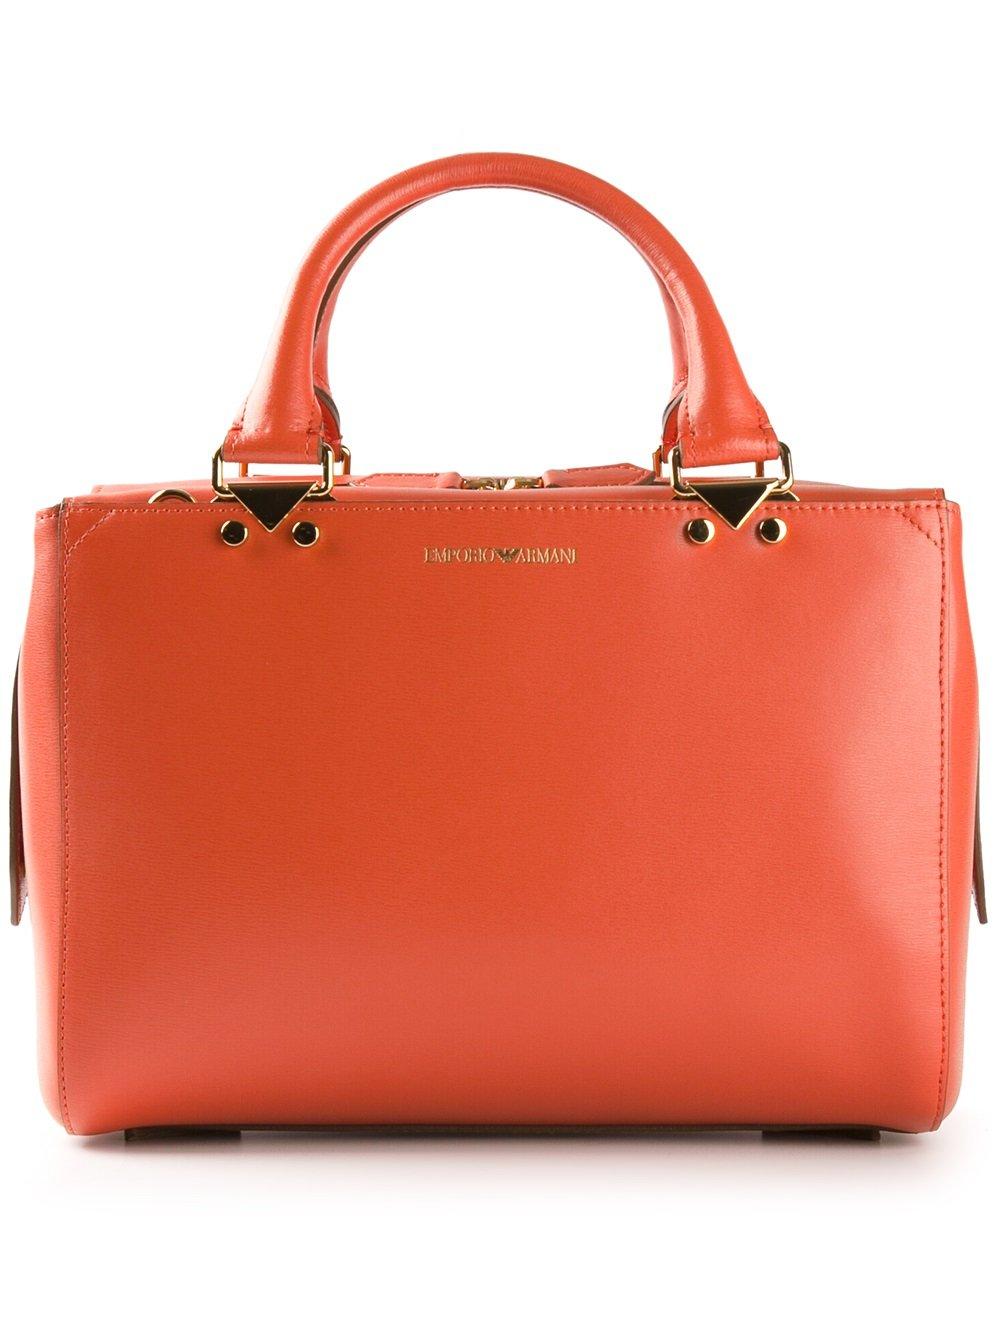 Emporio Armani Classic Tote Bag in Orange (yellow   orange 31278f2d1d9